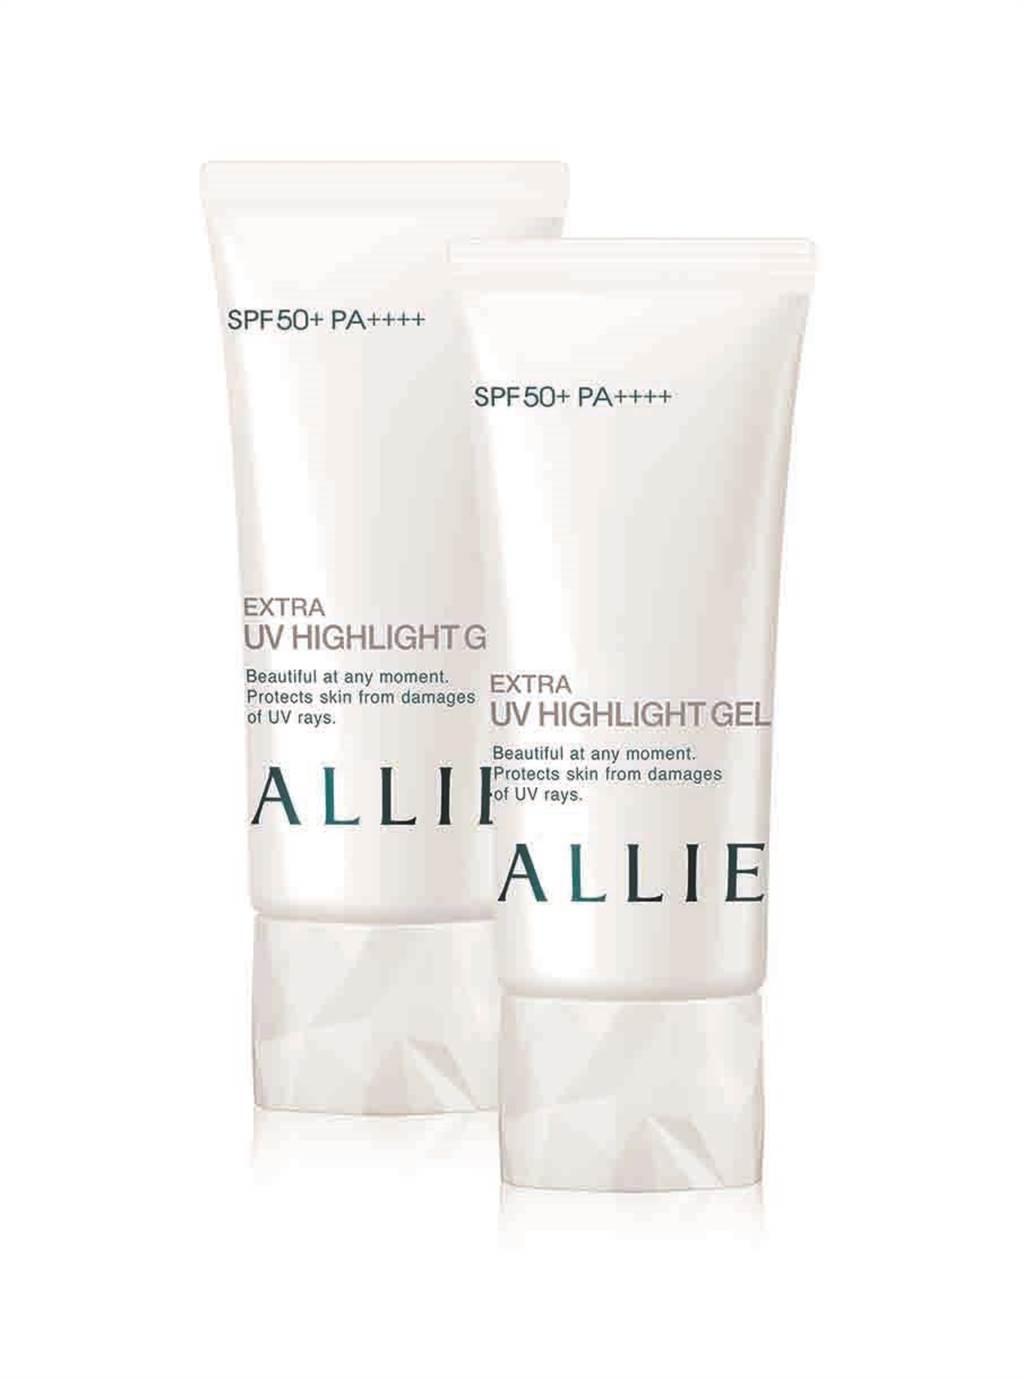 ALLIE EX UV高效防曬亮白水凝乳60gX2。(ALLIE提供)